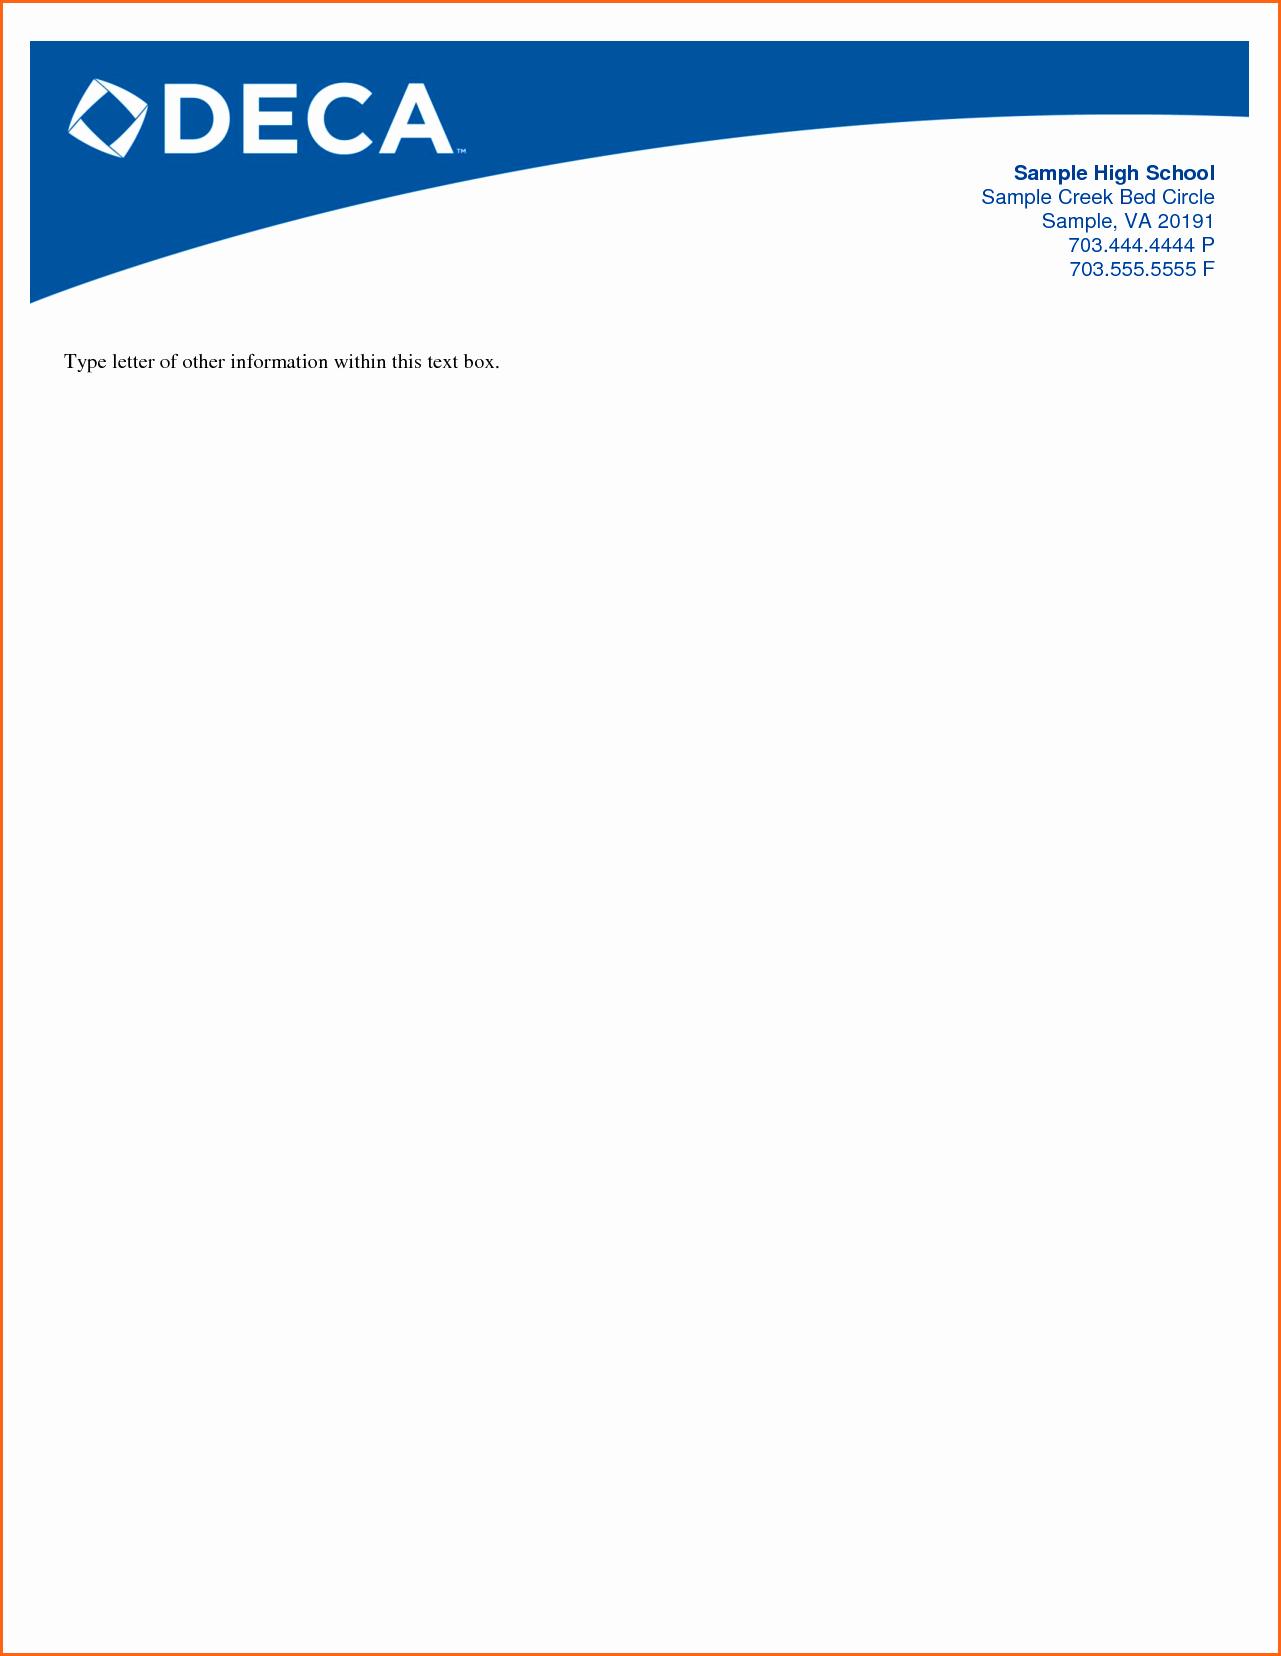 Sample Business Letter On Letterhead New Business Letterhead format Example Mughals